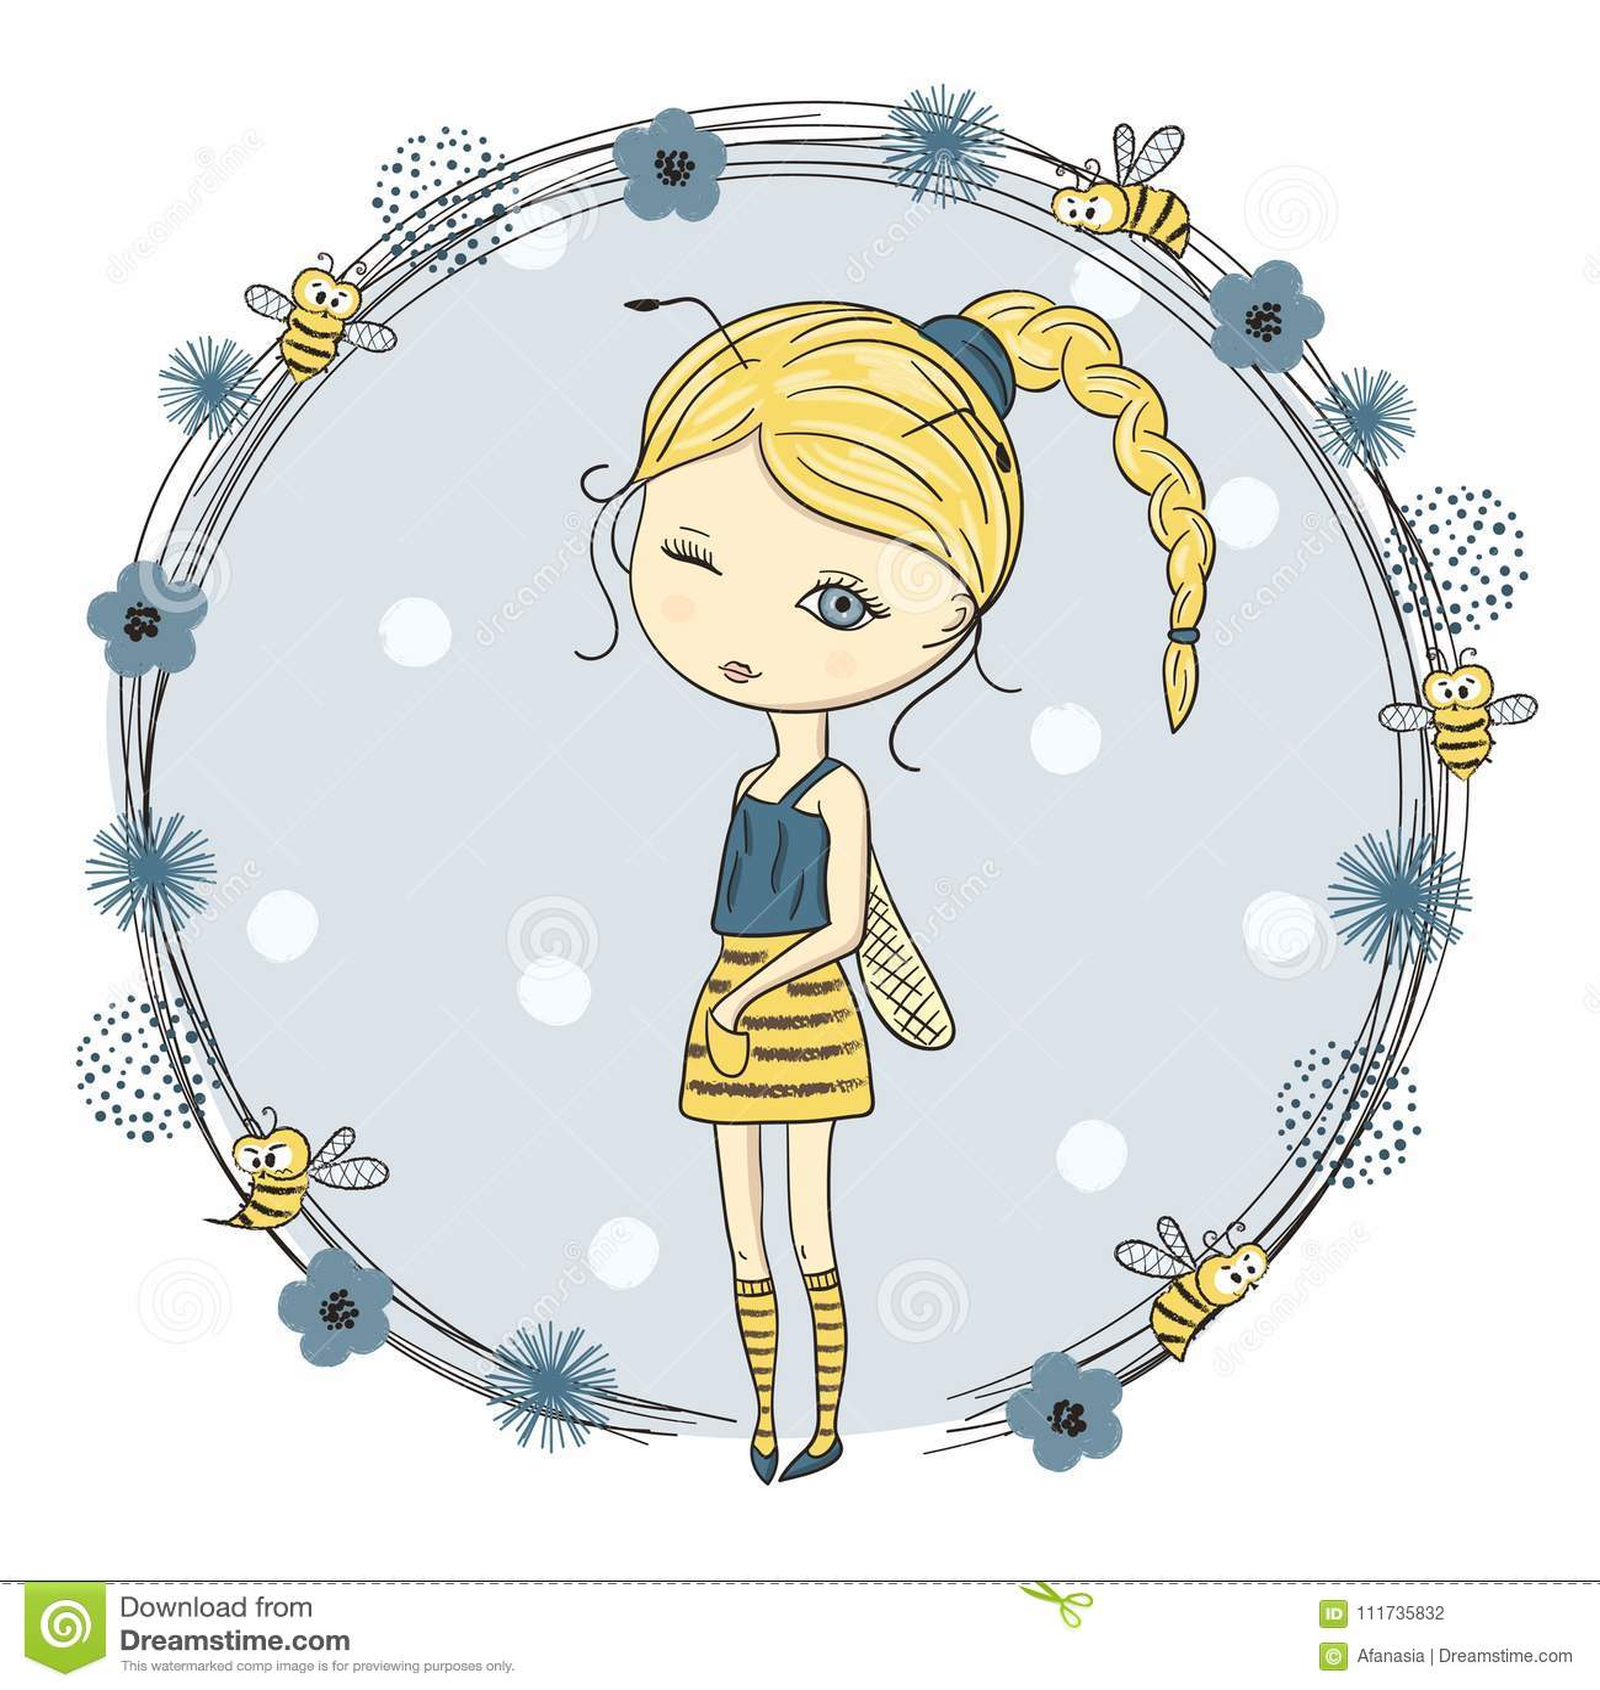 Cute little girl in a bee costume.